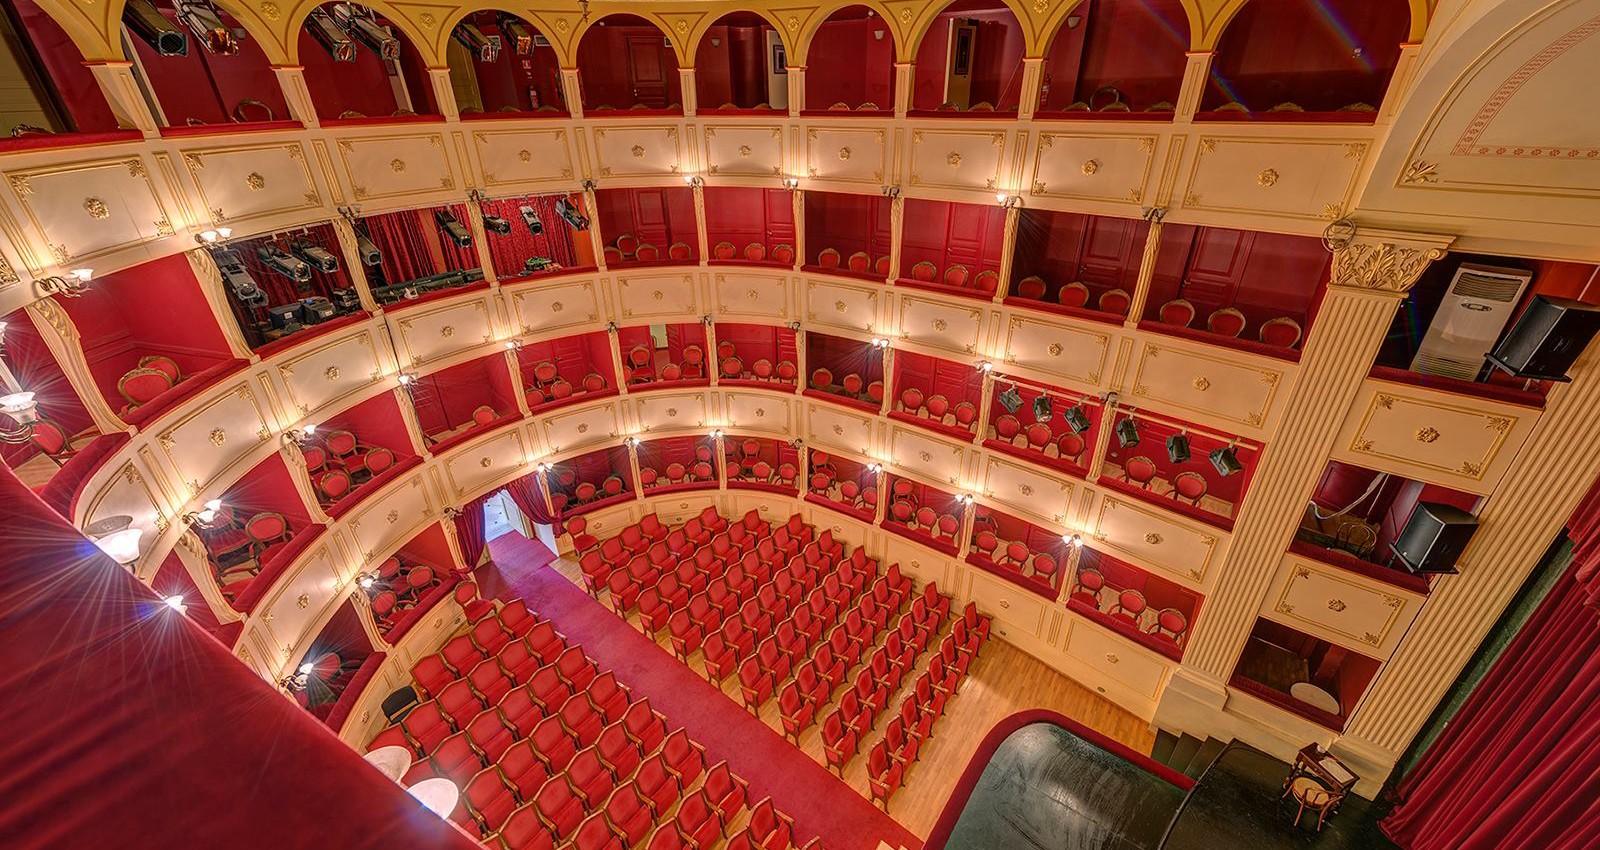 apollon theater 2